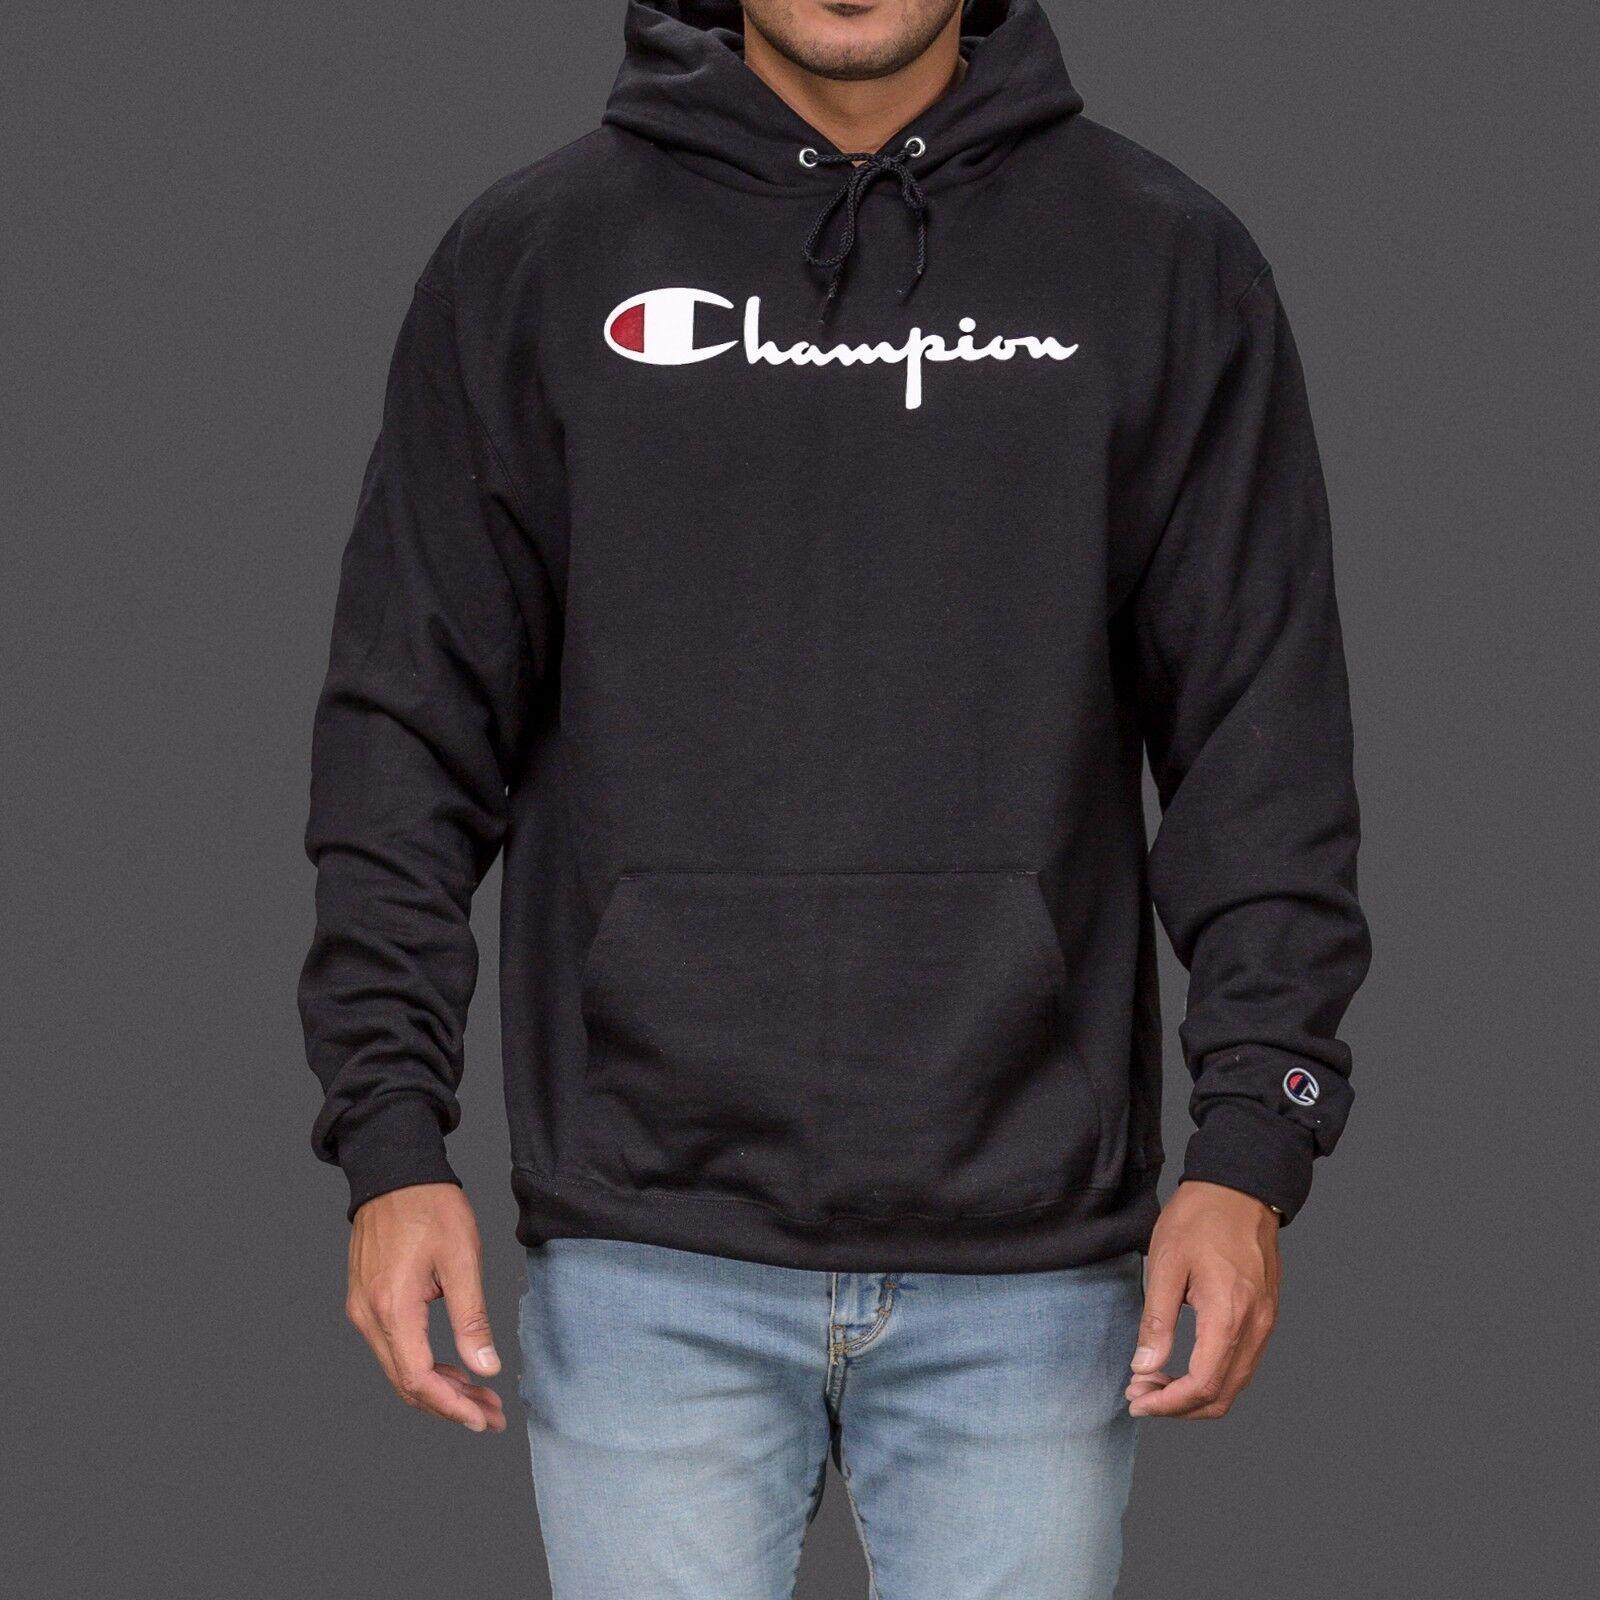 Худи или толстовка для мужчины Black Authentic Champion sportswear logo  hoodie hoody hooded sweatshirt - 222664224927 - купить на eBay.com (США) с  доставкой ... 34cf38620d2b